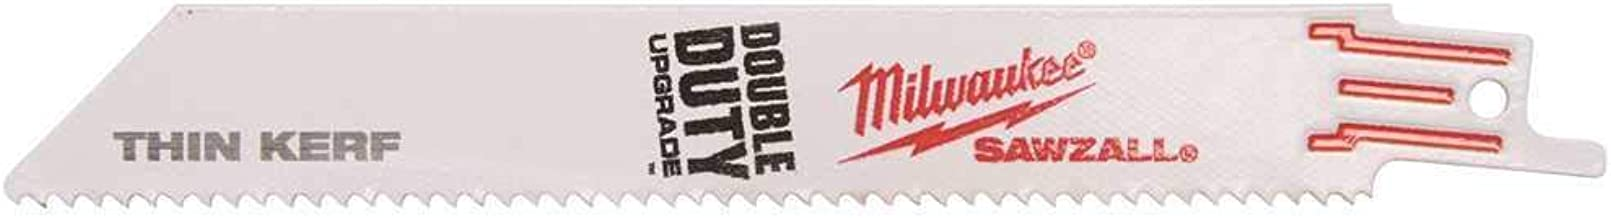 Milwaukee Säbelsägeblatt Metall 230 x 1,4 mm 50 Stück Sägeblatt Metallsägeblatt